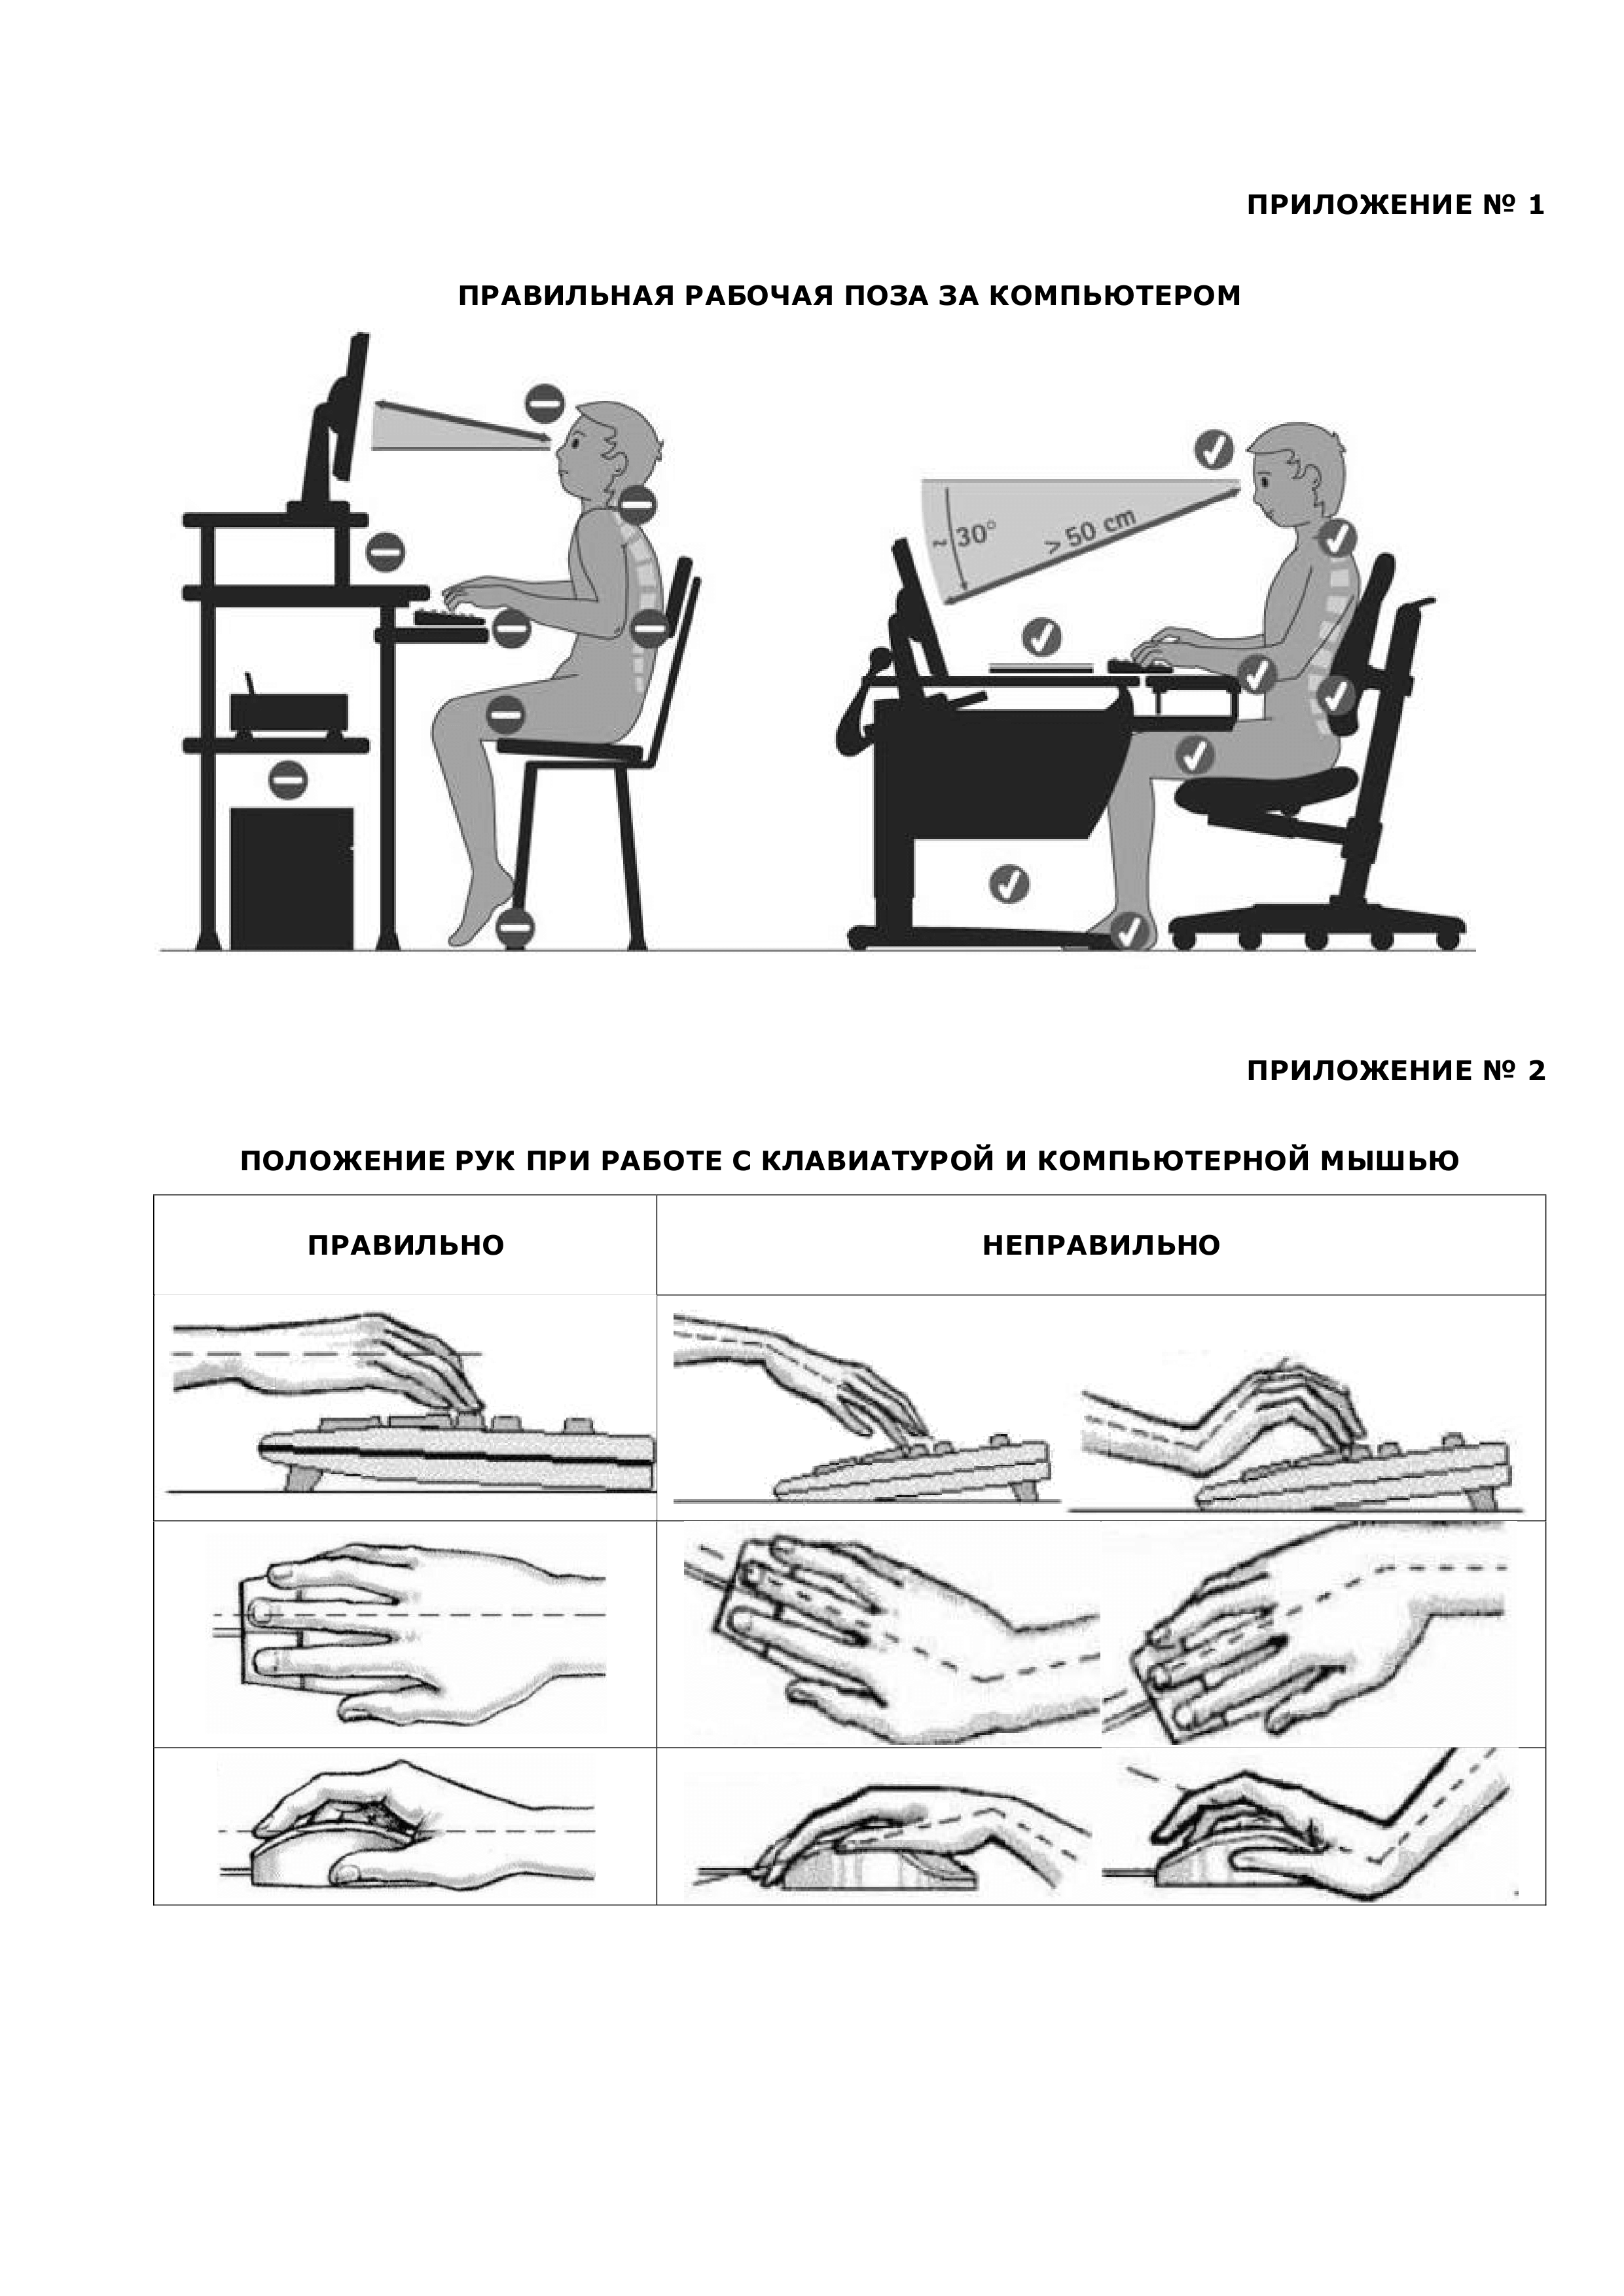 Инструкция по охране труда диспетчера